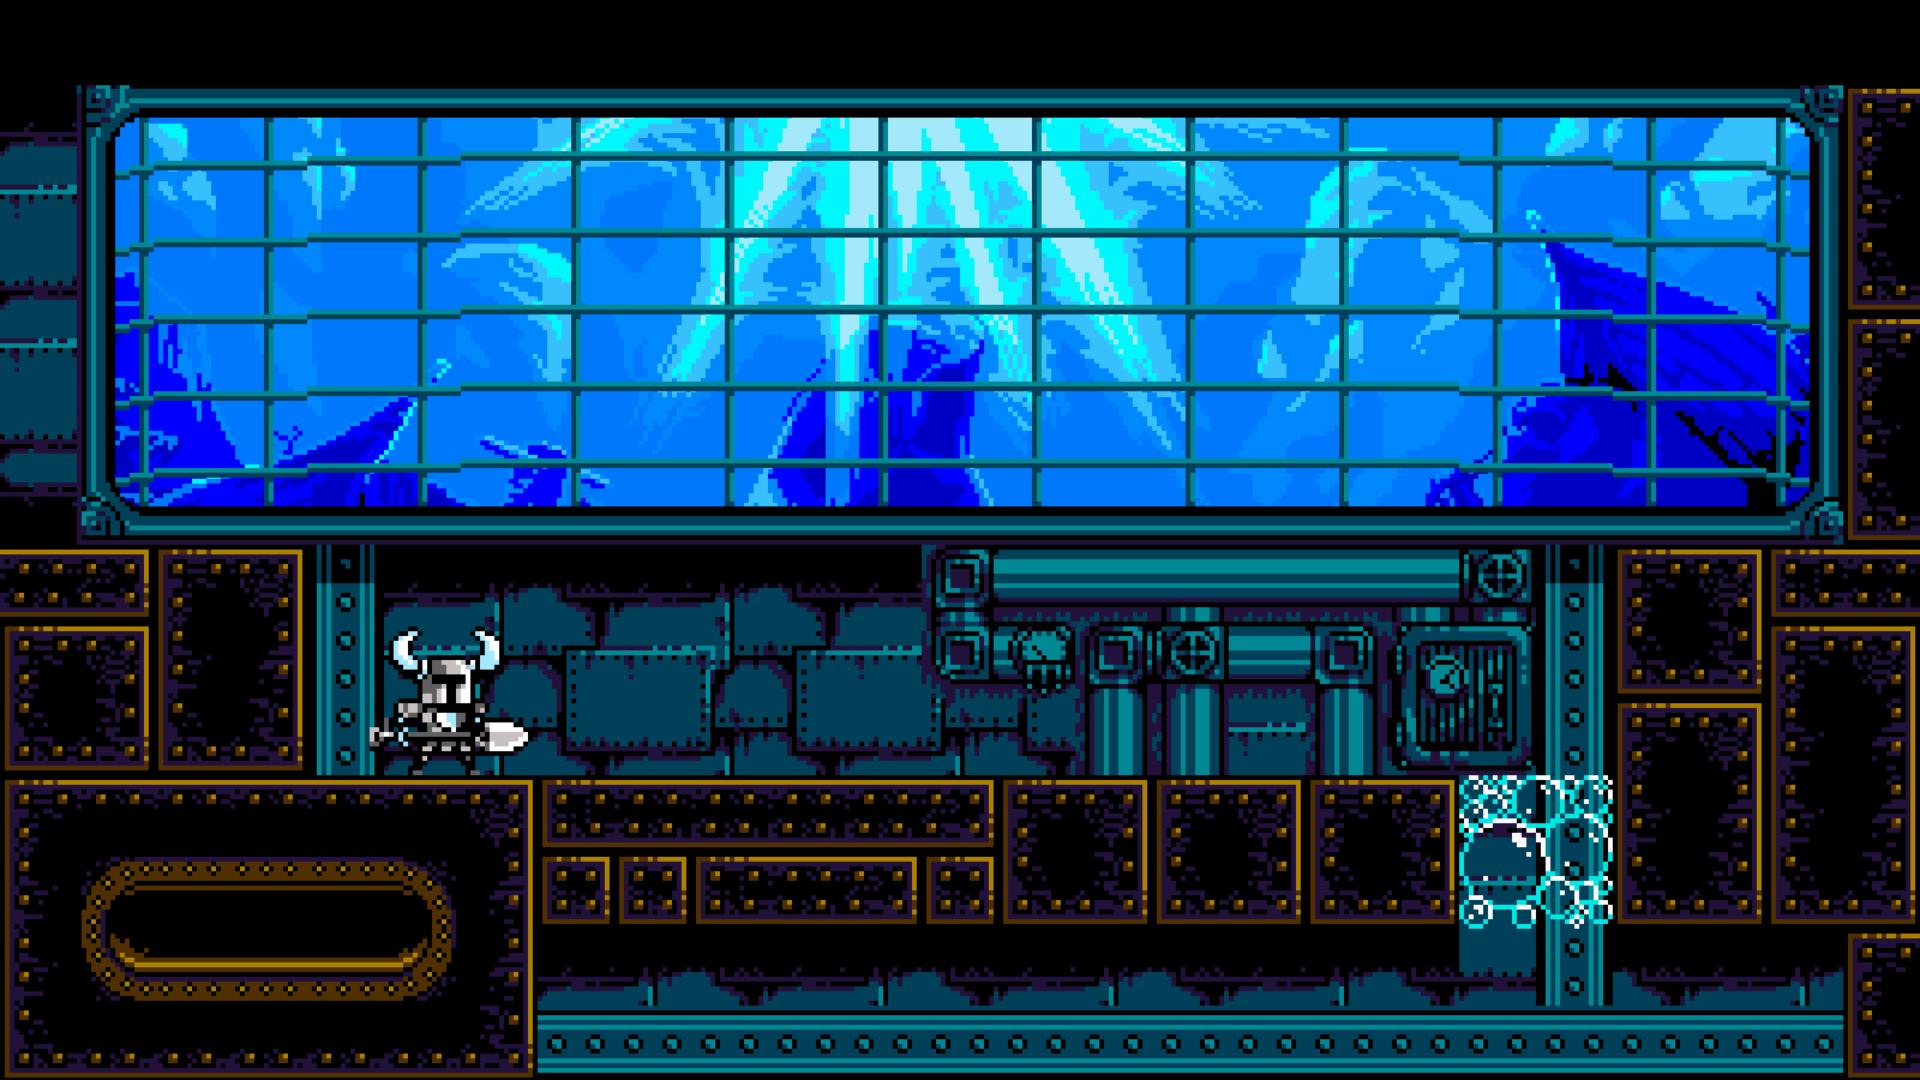 Wallpaper : video games, pixel art, retro games, 16 bit